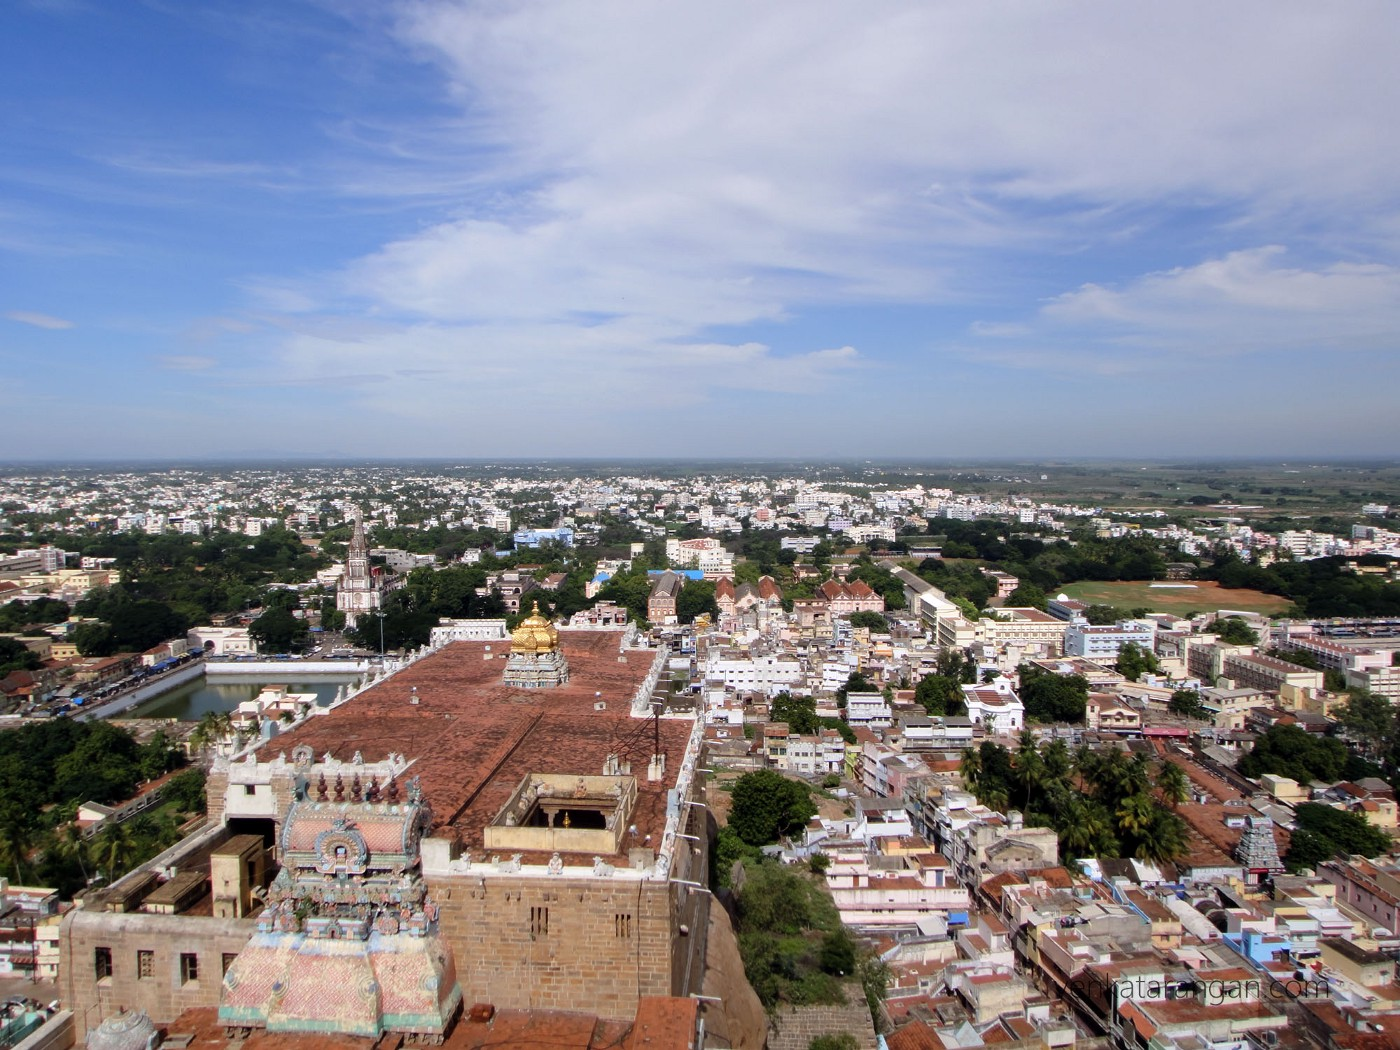 View of Trichy Rockfort temple (திருச்சி உச்சிப்பிள்ளையார் கோயில்) from the top